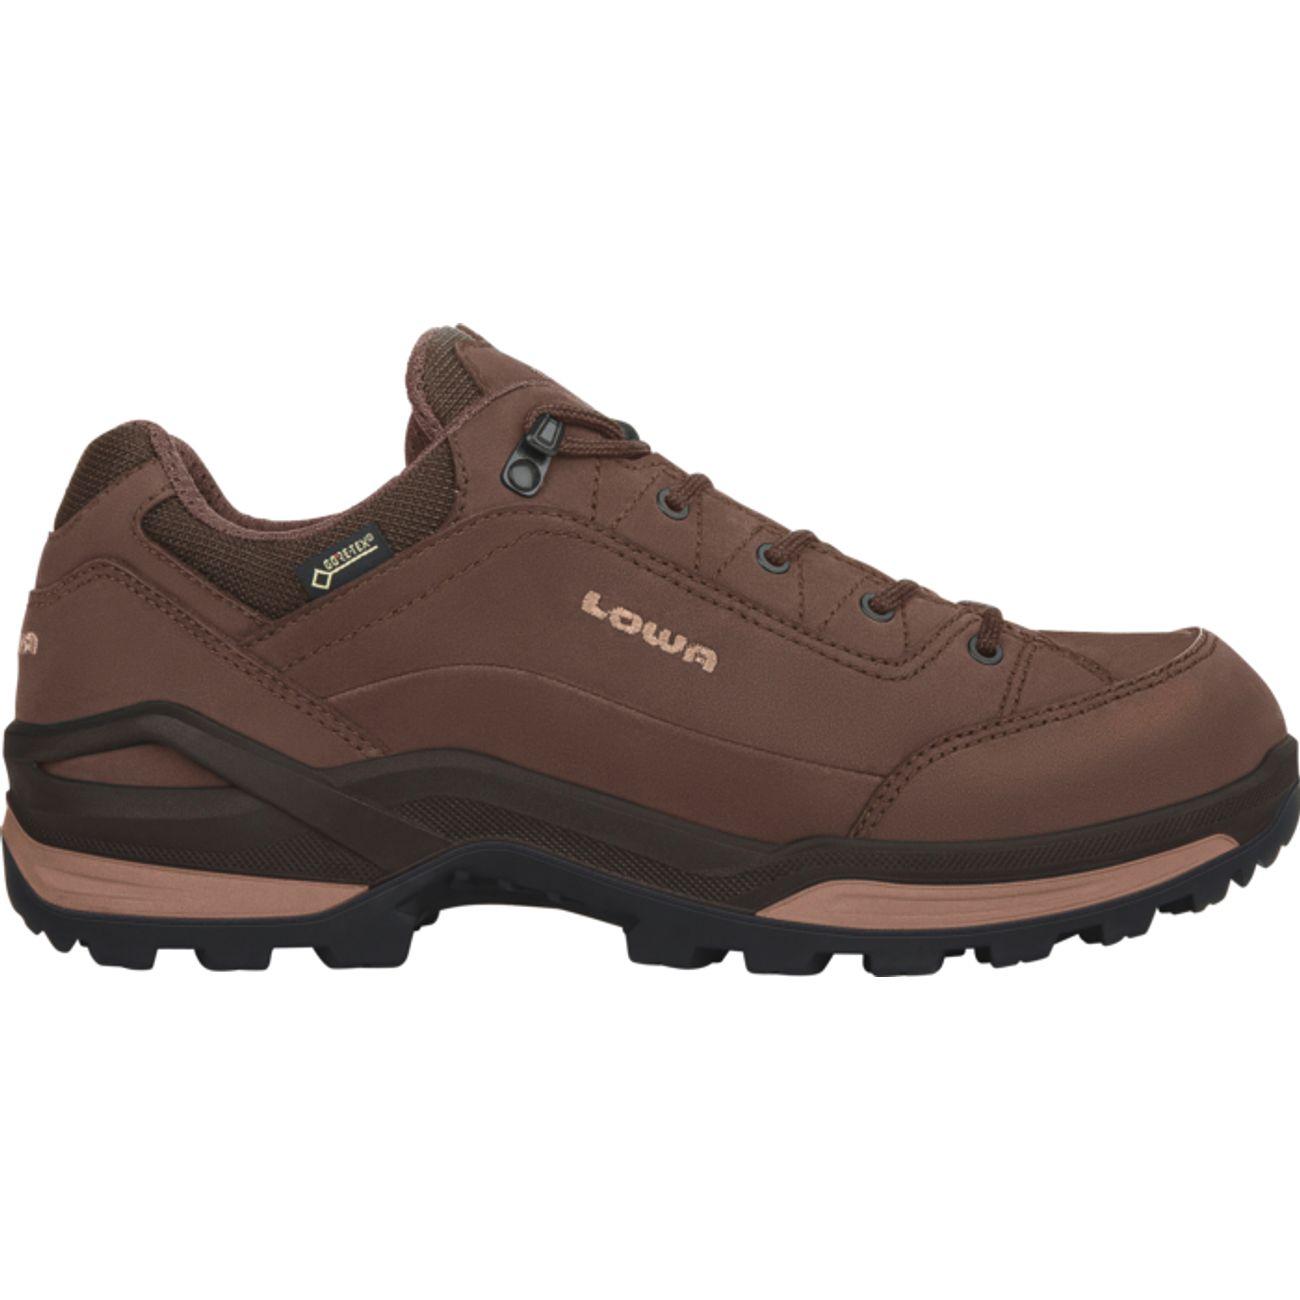 Marron Chaussures Homme Renegade Lowa Gtx Low Randonnée 34AR5jqLc